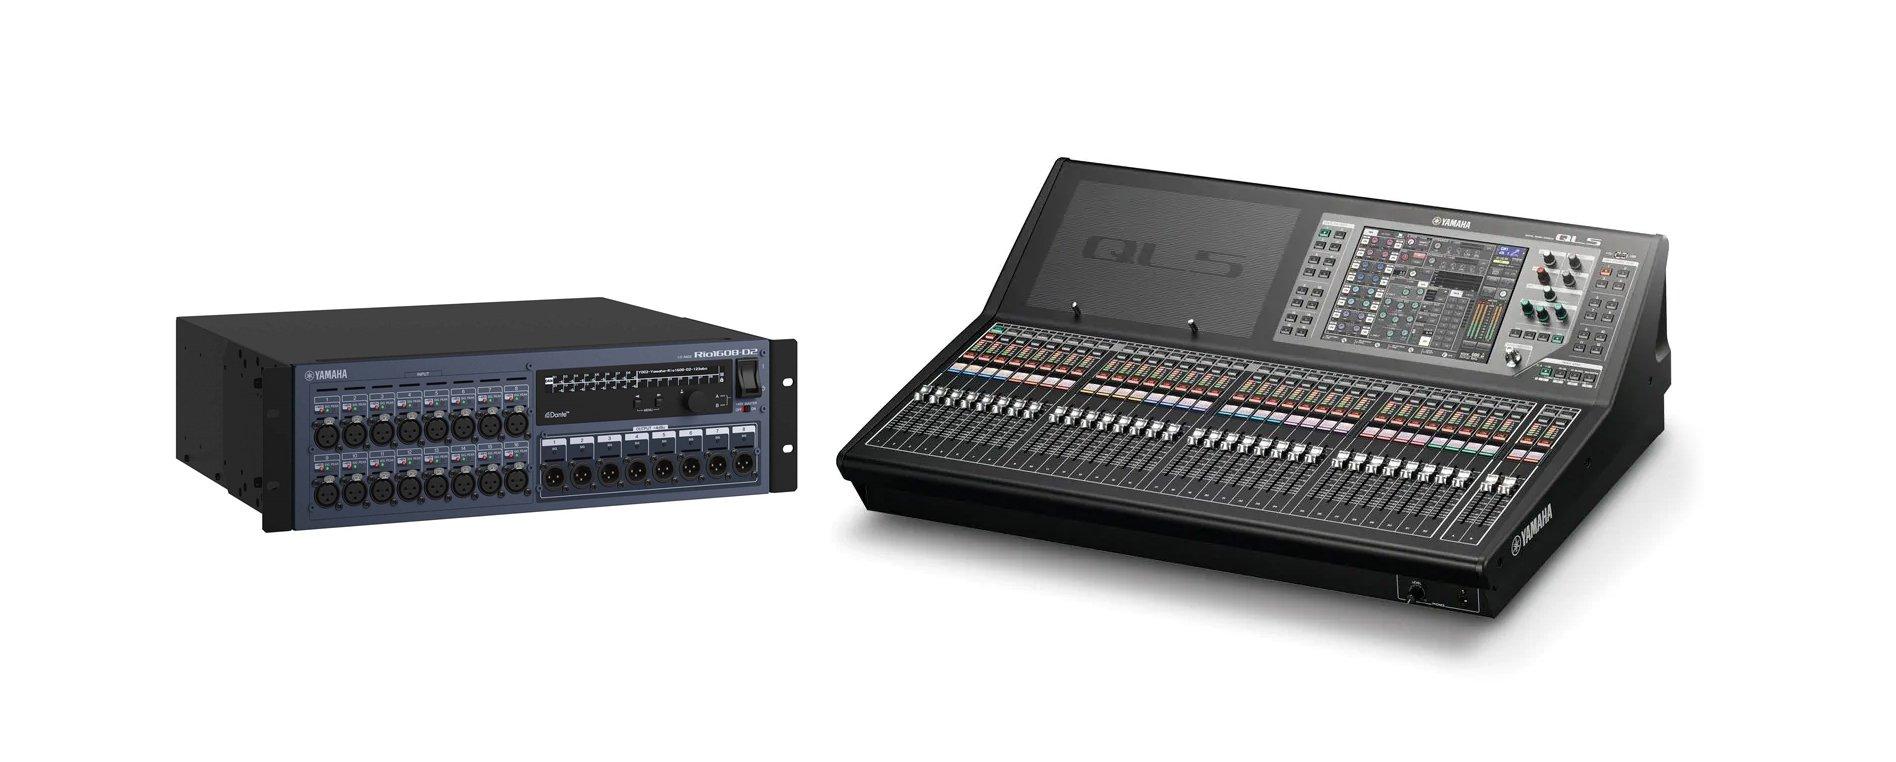 Mixer Yamaha Ql5 : yamaha ql5 promo digital mixer and rio1608 d2 stagebox bundle full compass systems ~ Russianpoet.info Haus und Dekorationen